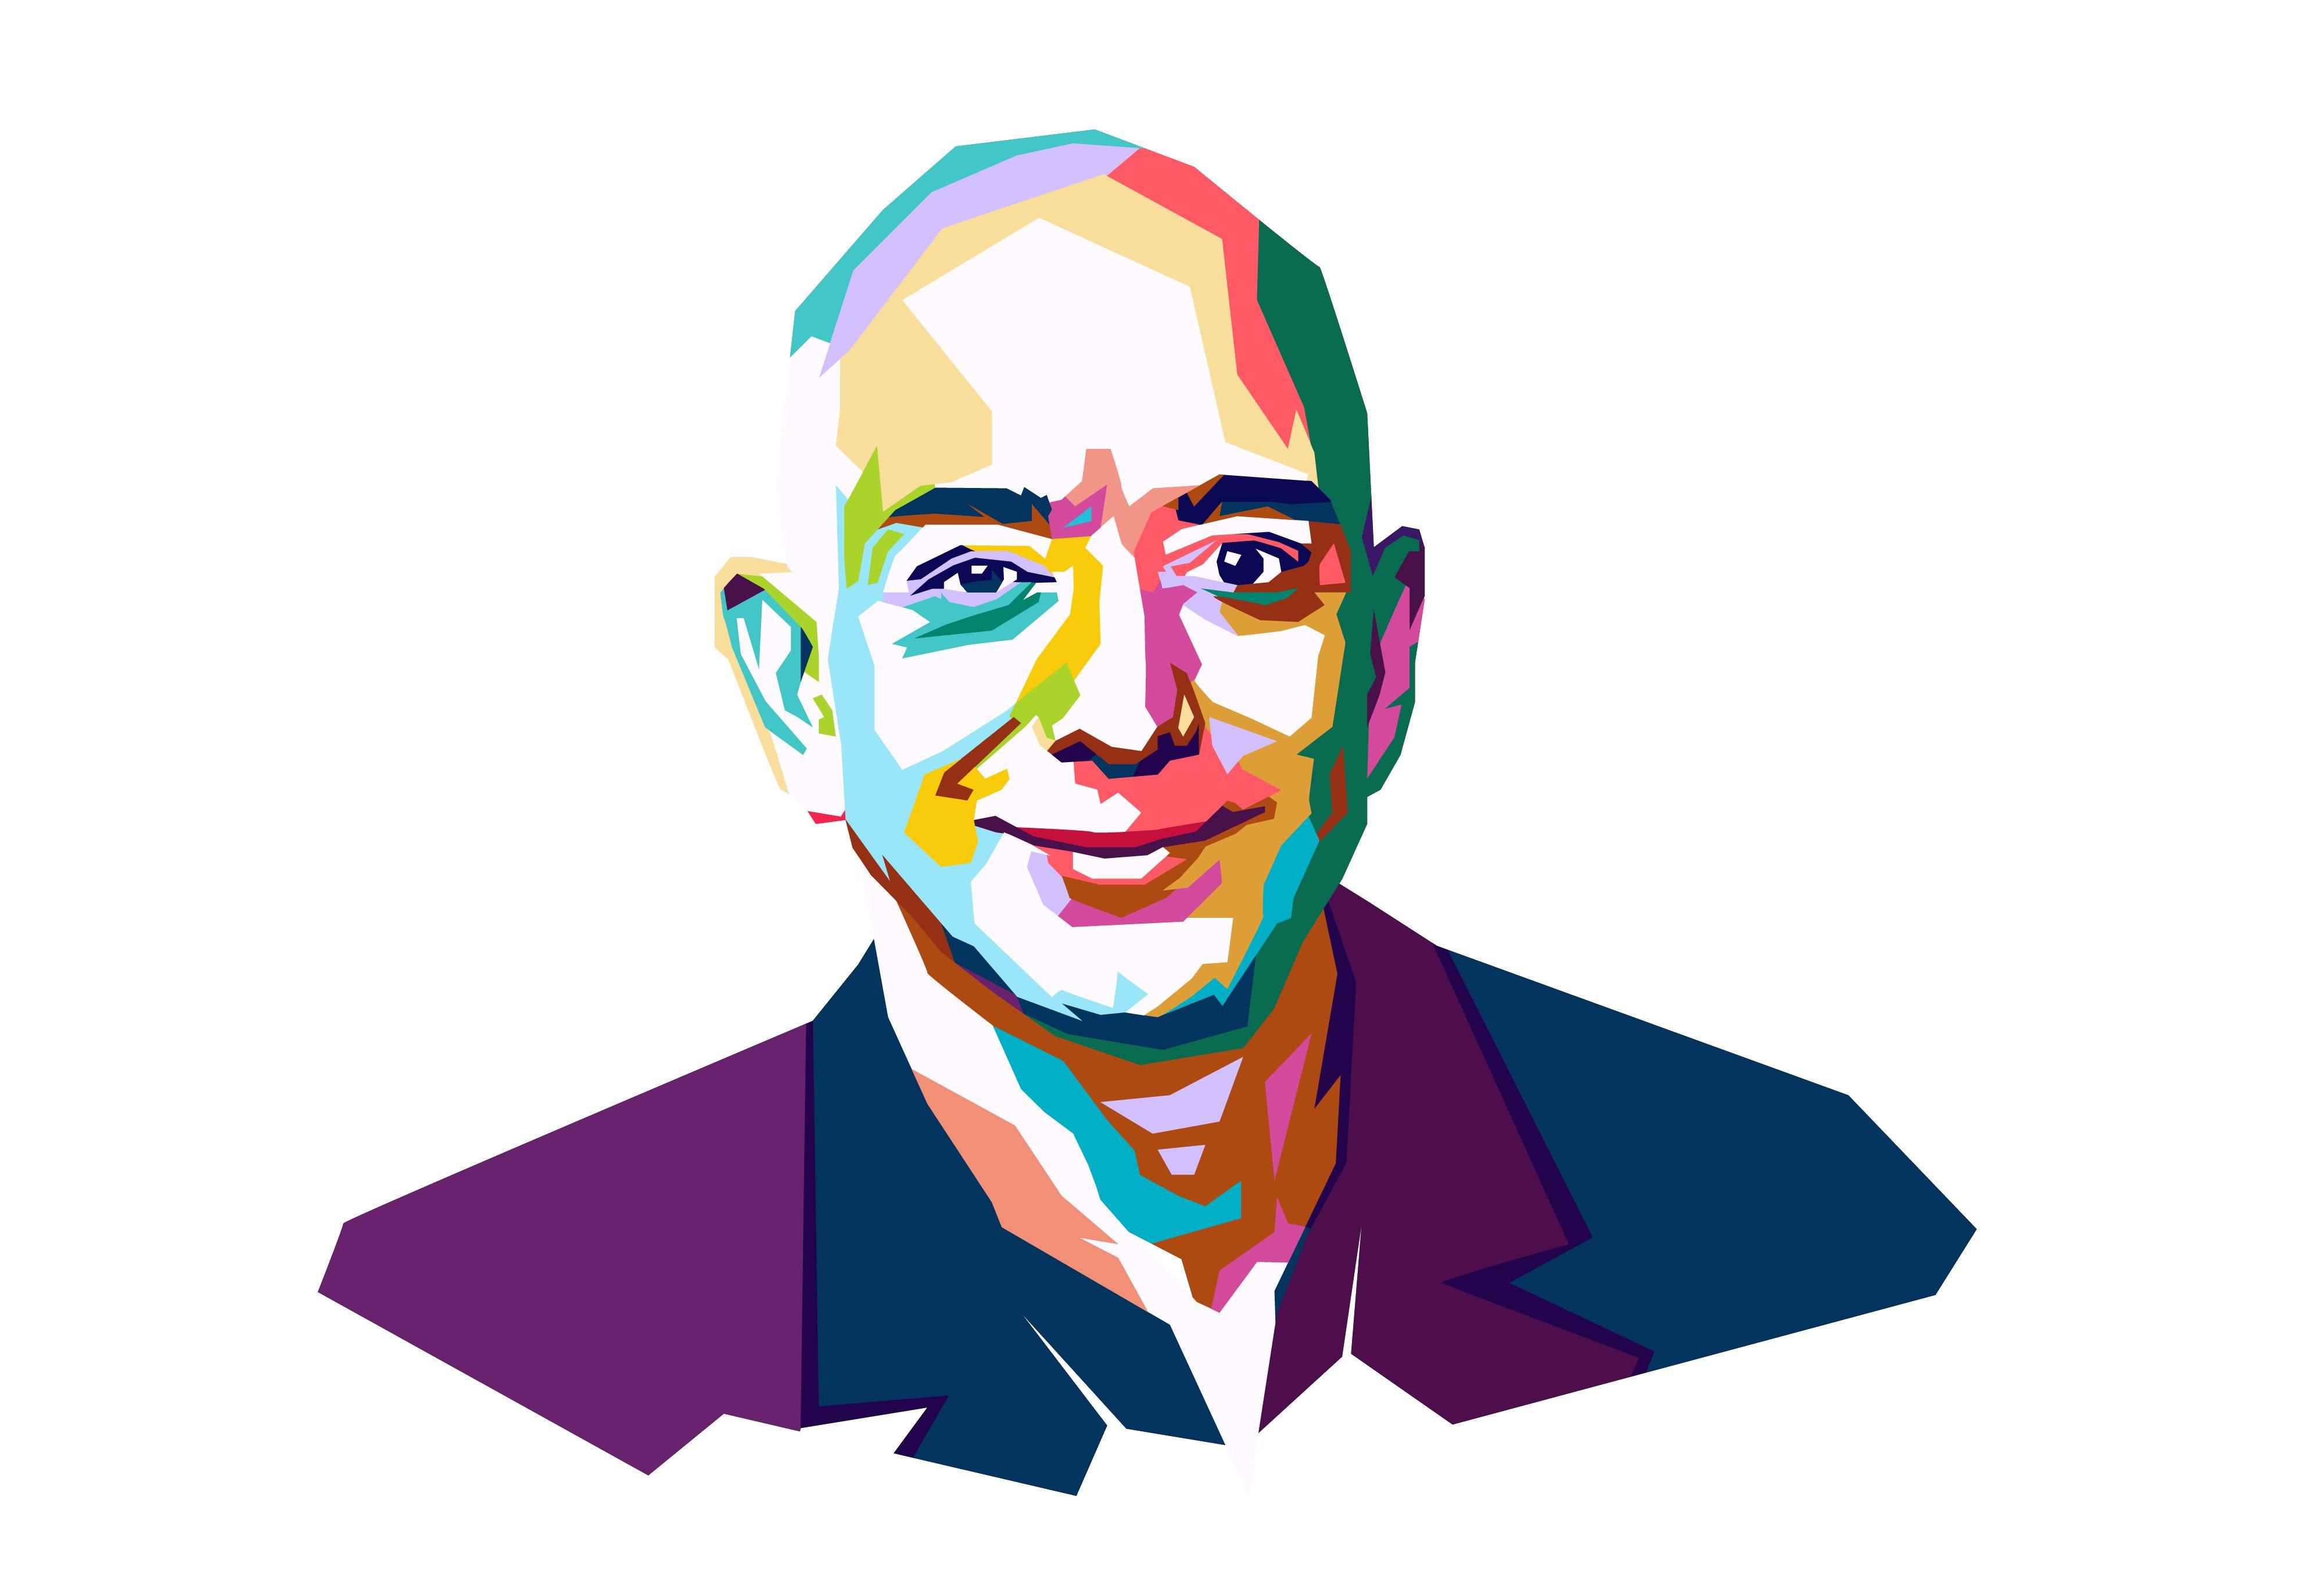 Jeff Bezos In 2020 Jeff Bezos Bezos Wpap Art